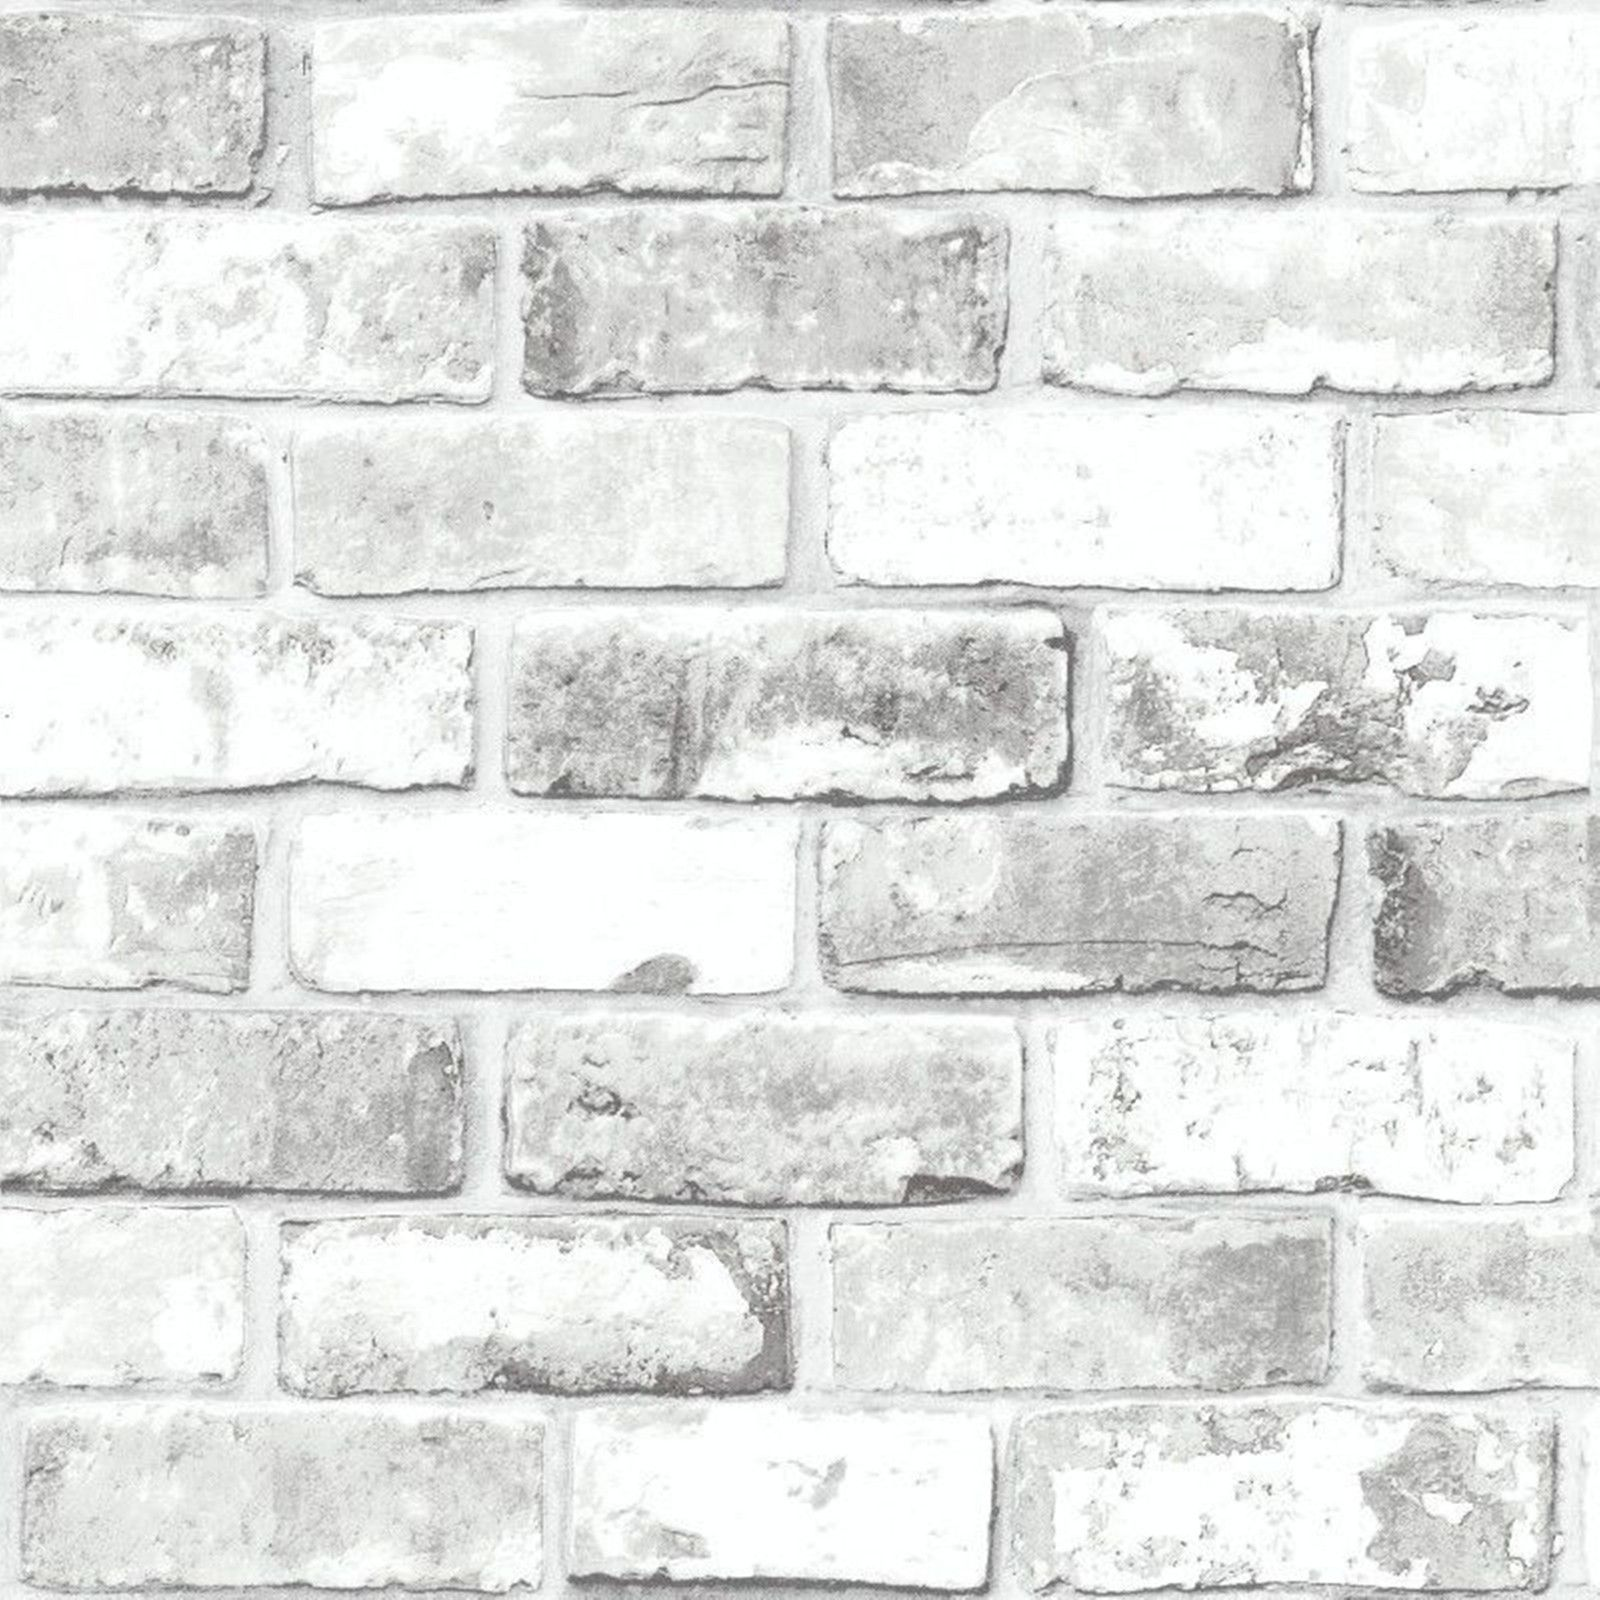 Brick Effect Wallpaper Slate 3D Weathered Stone Realistic